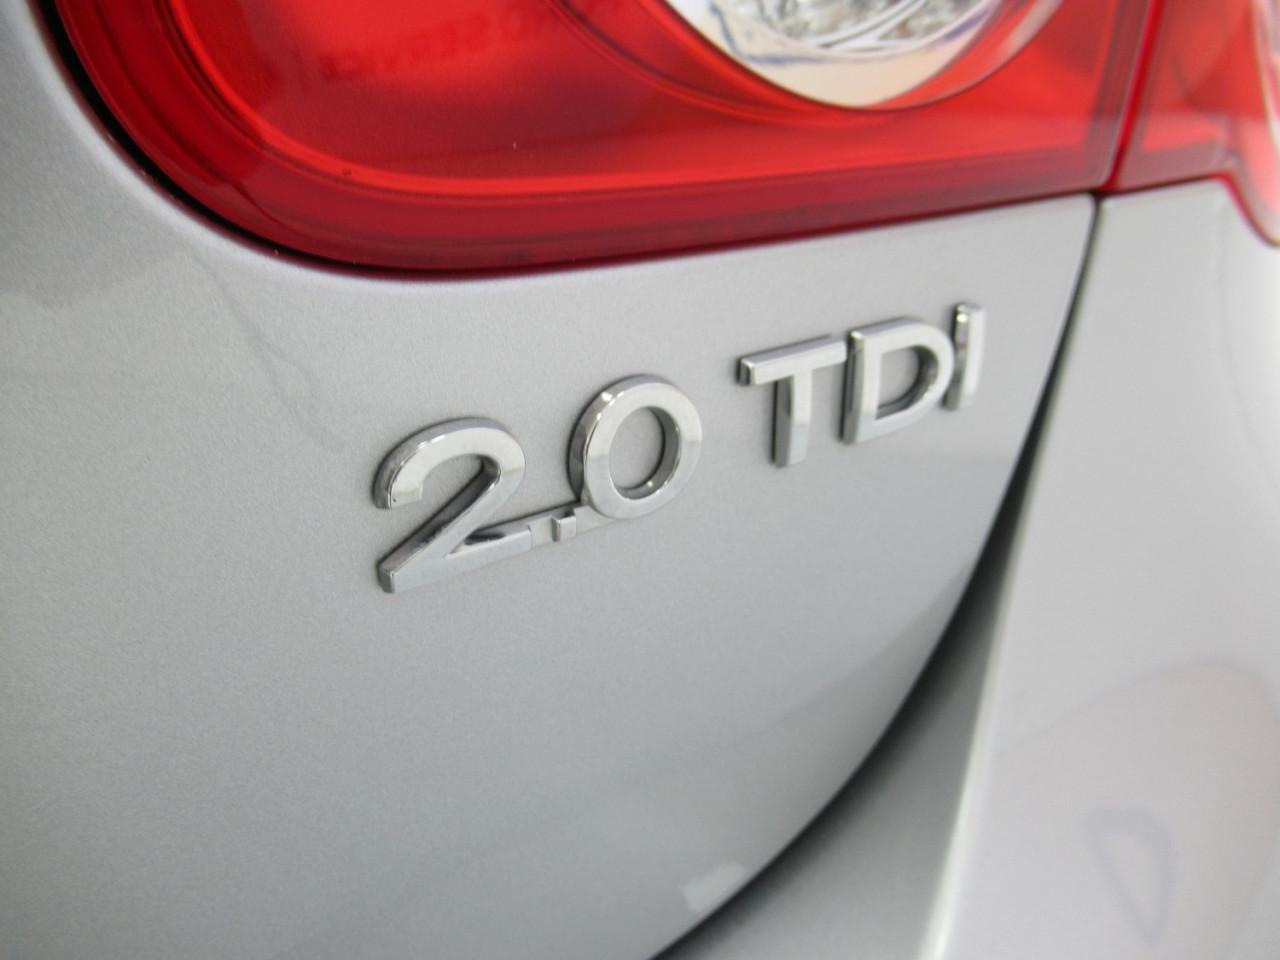 2010 Volkswagen Jetta 1KM MY10 103TDI Sedan Image 7